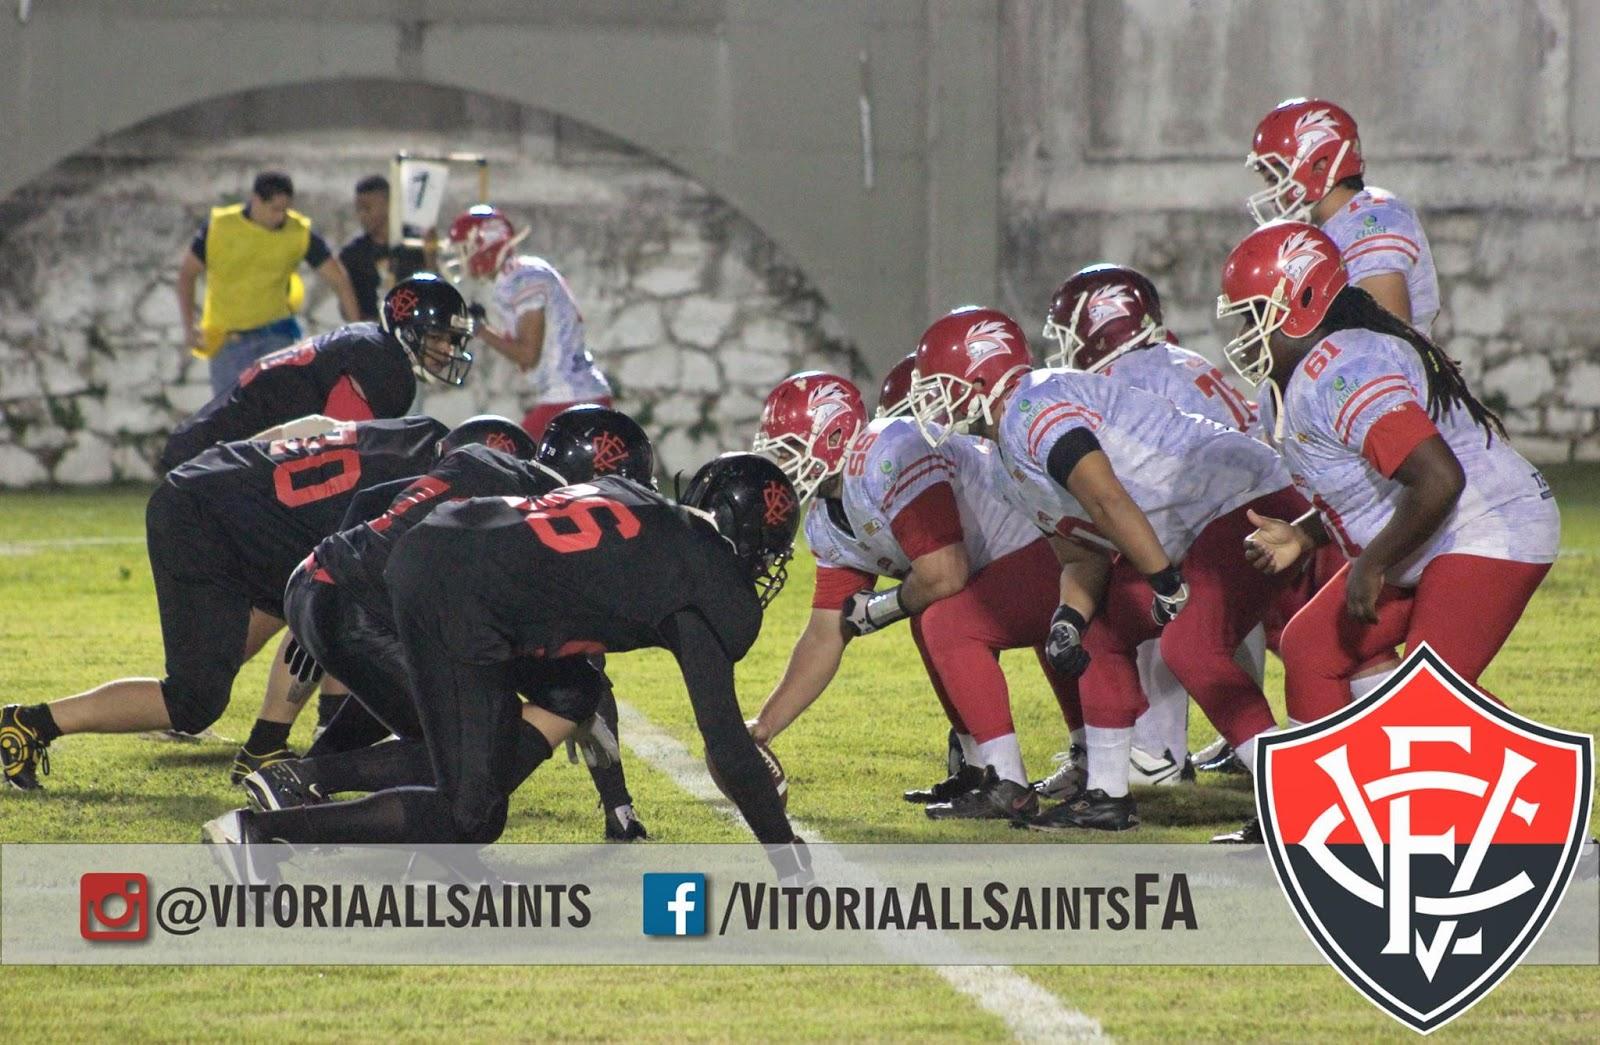 FUTEBOL AMERICANO  Vitória All Saints perde na estreia da Superliga  Nordeste 55ee6c232c44c